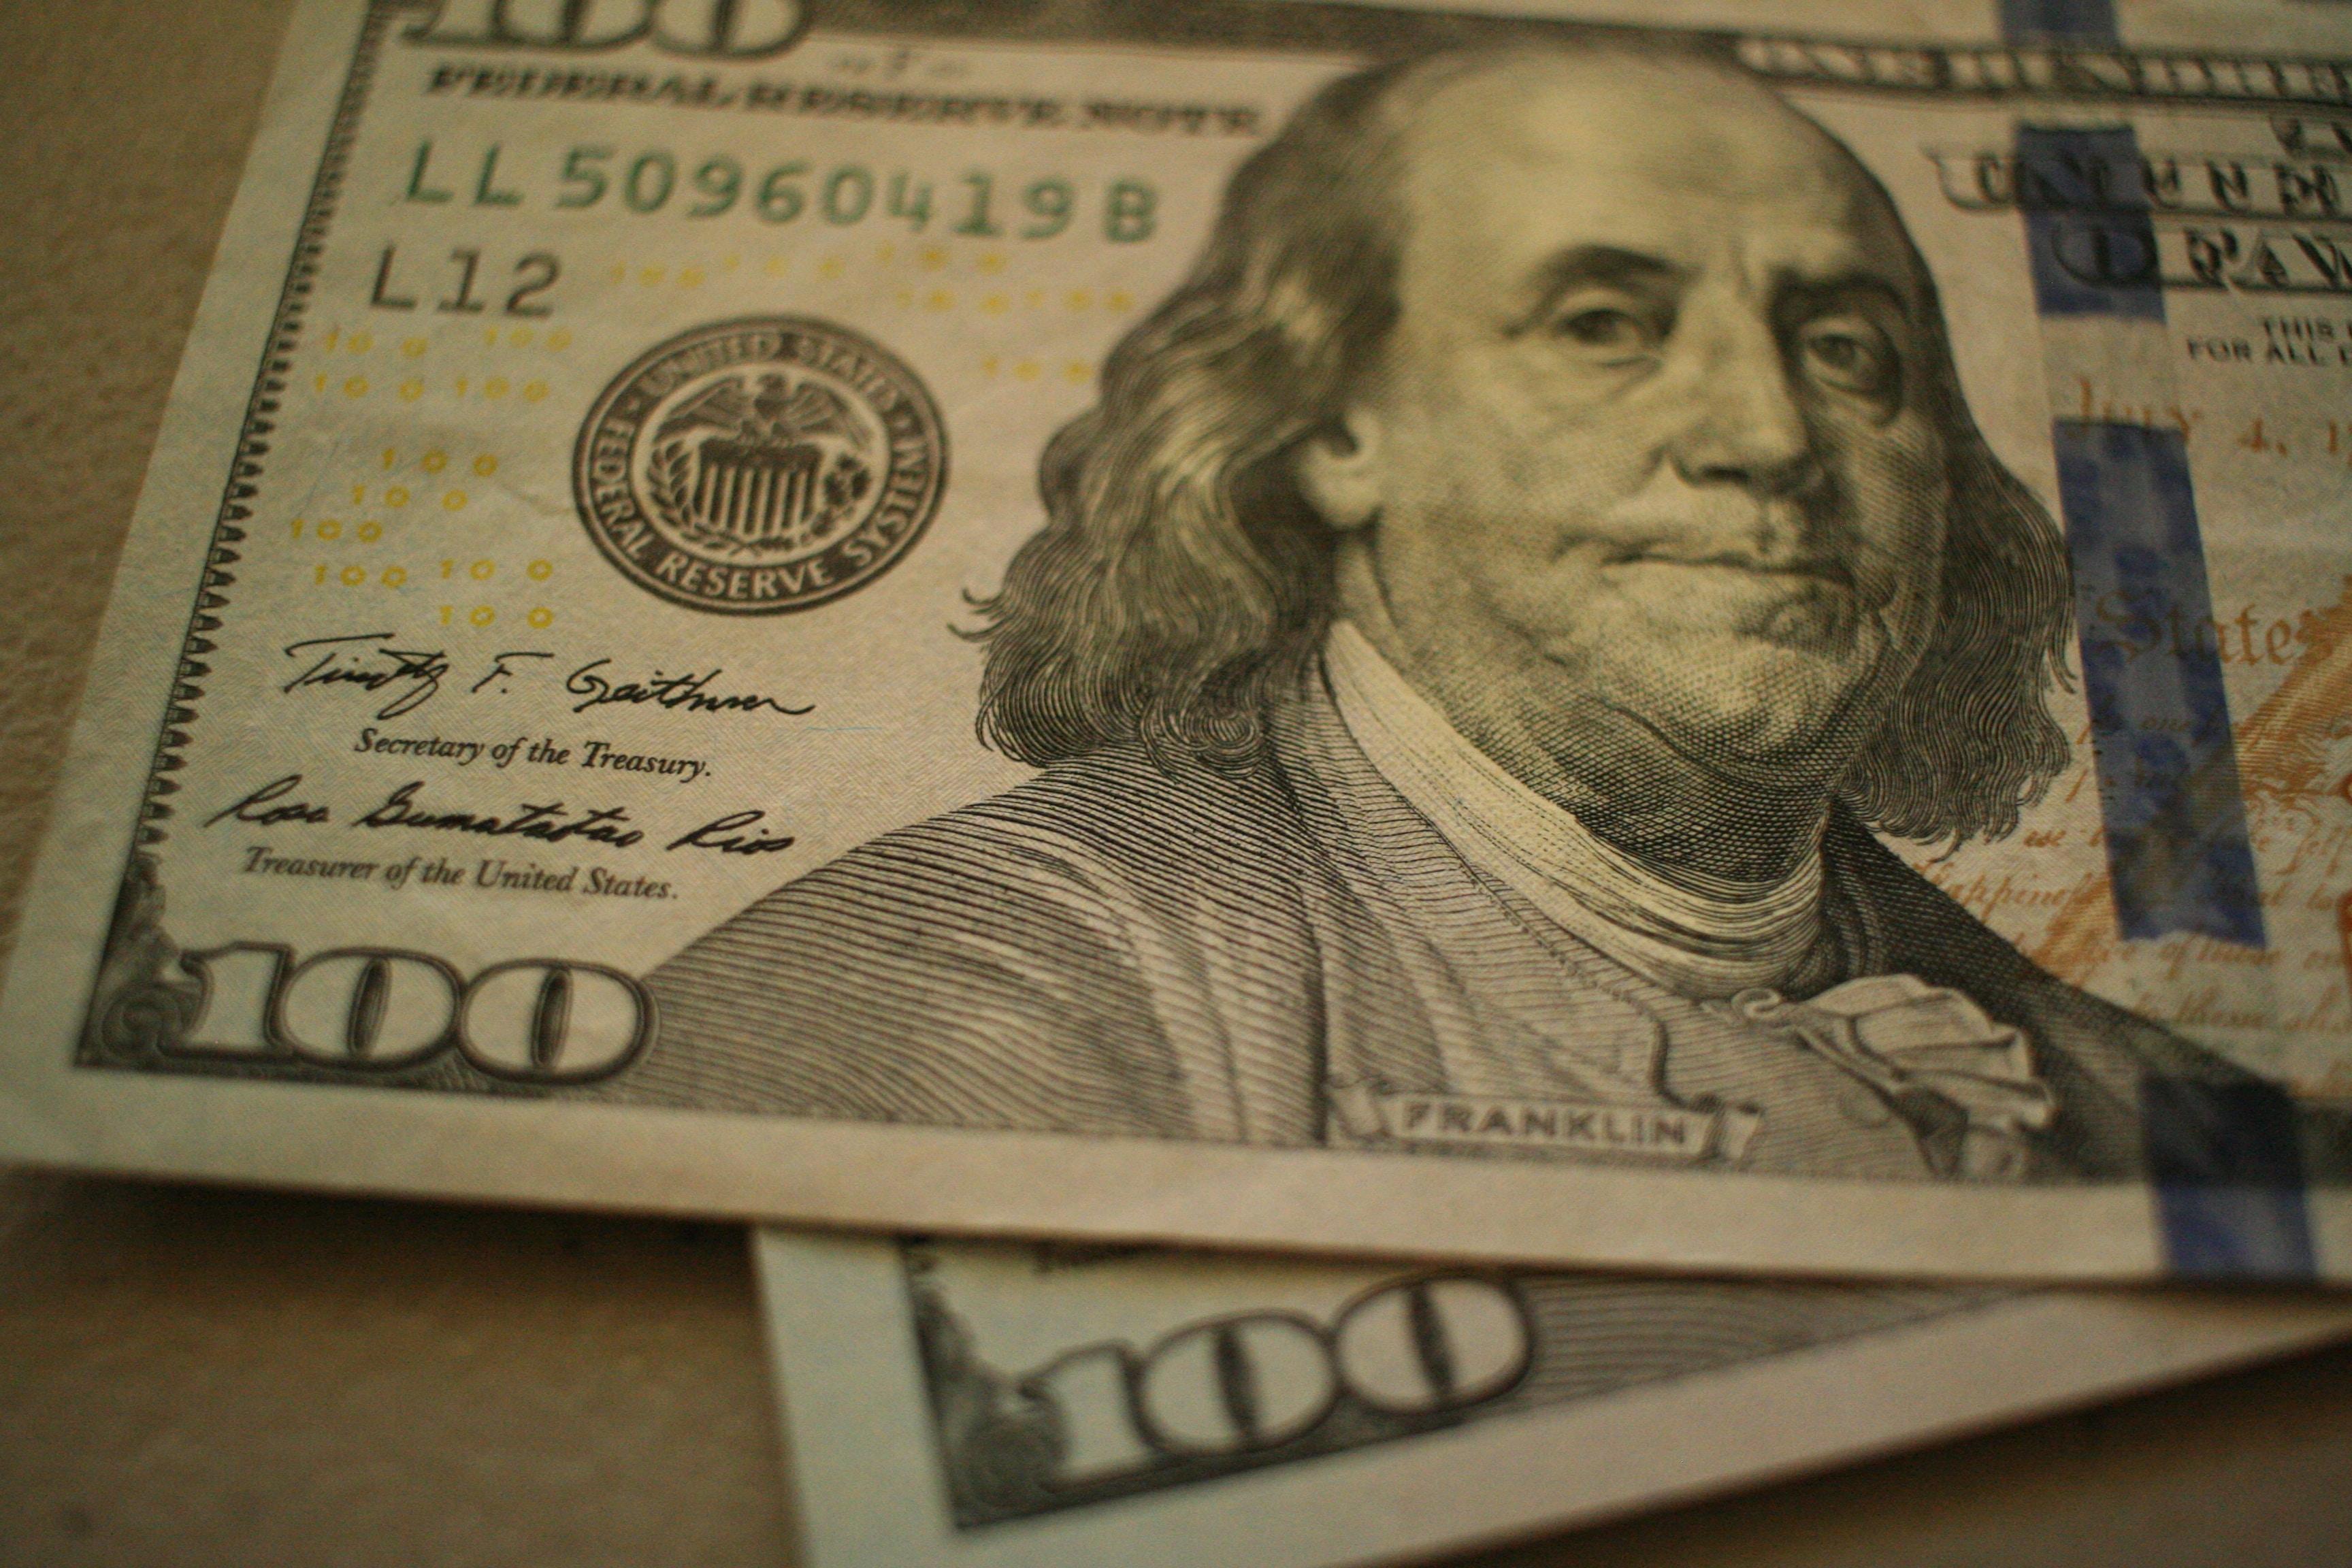 Two $100 bills.